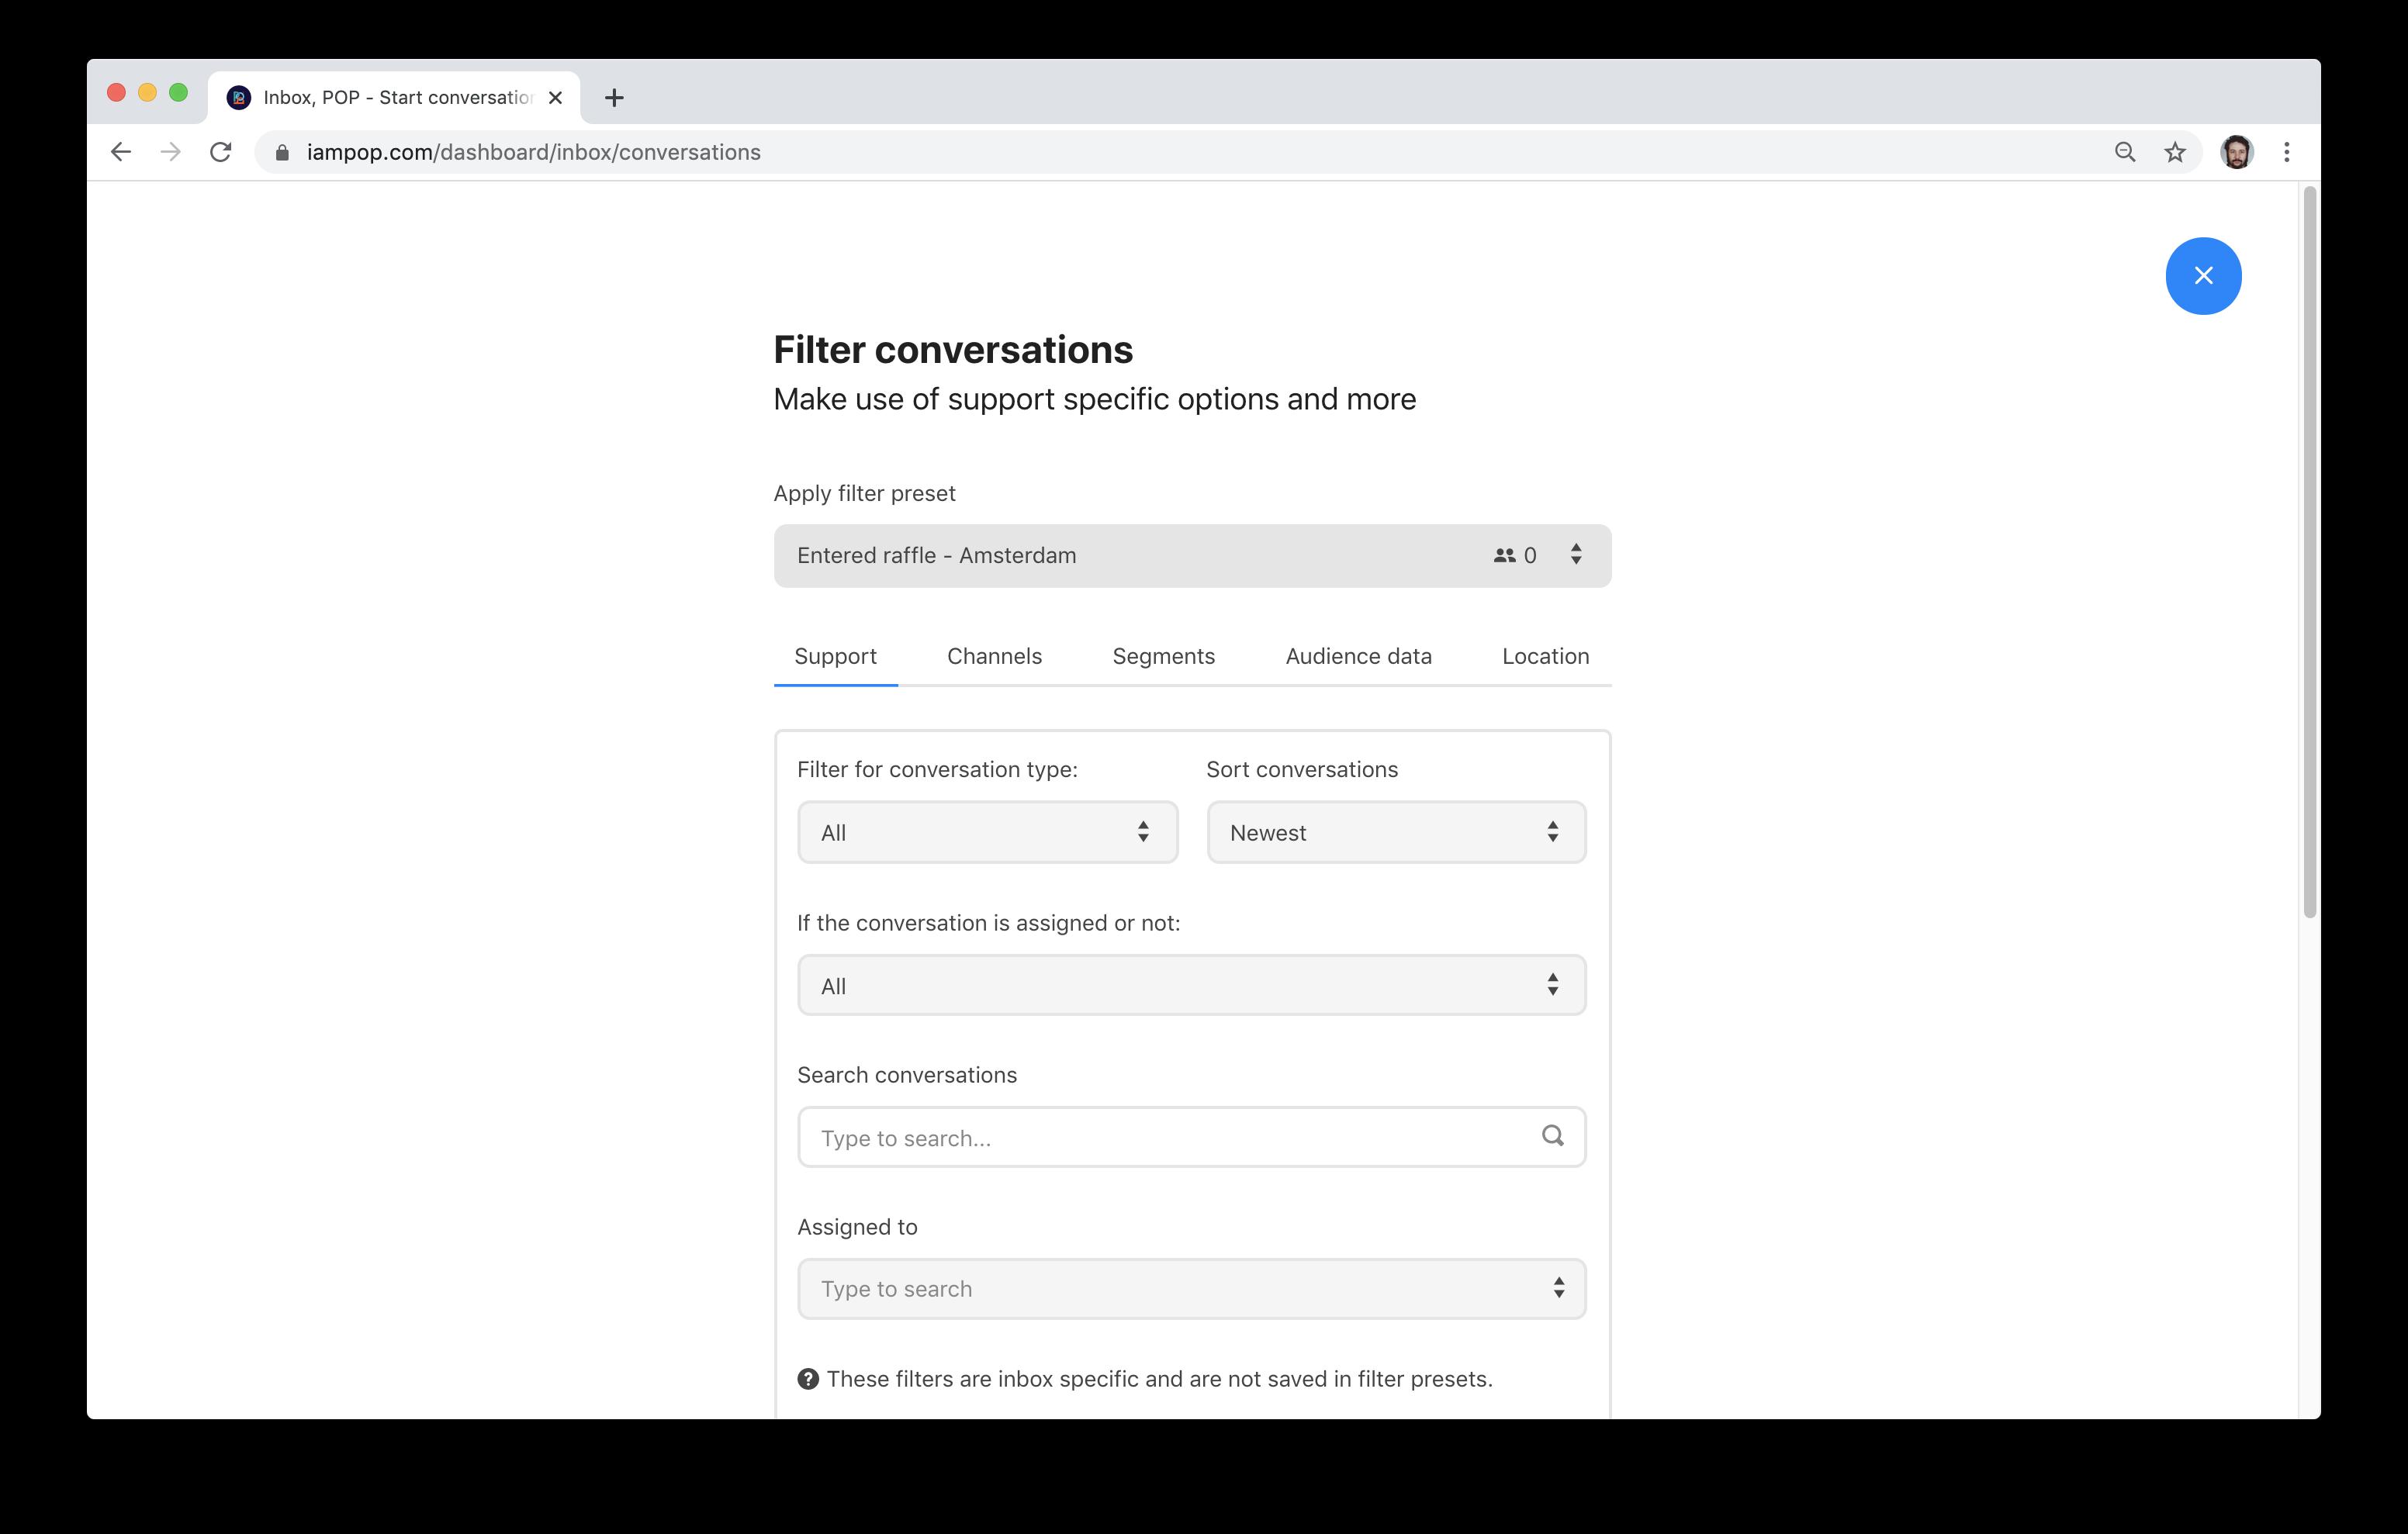 Applying-a-filter-preset-in-Inbox